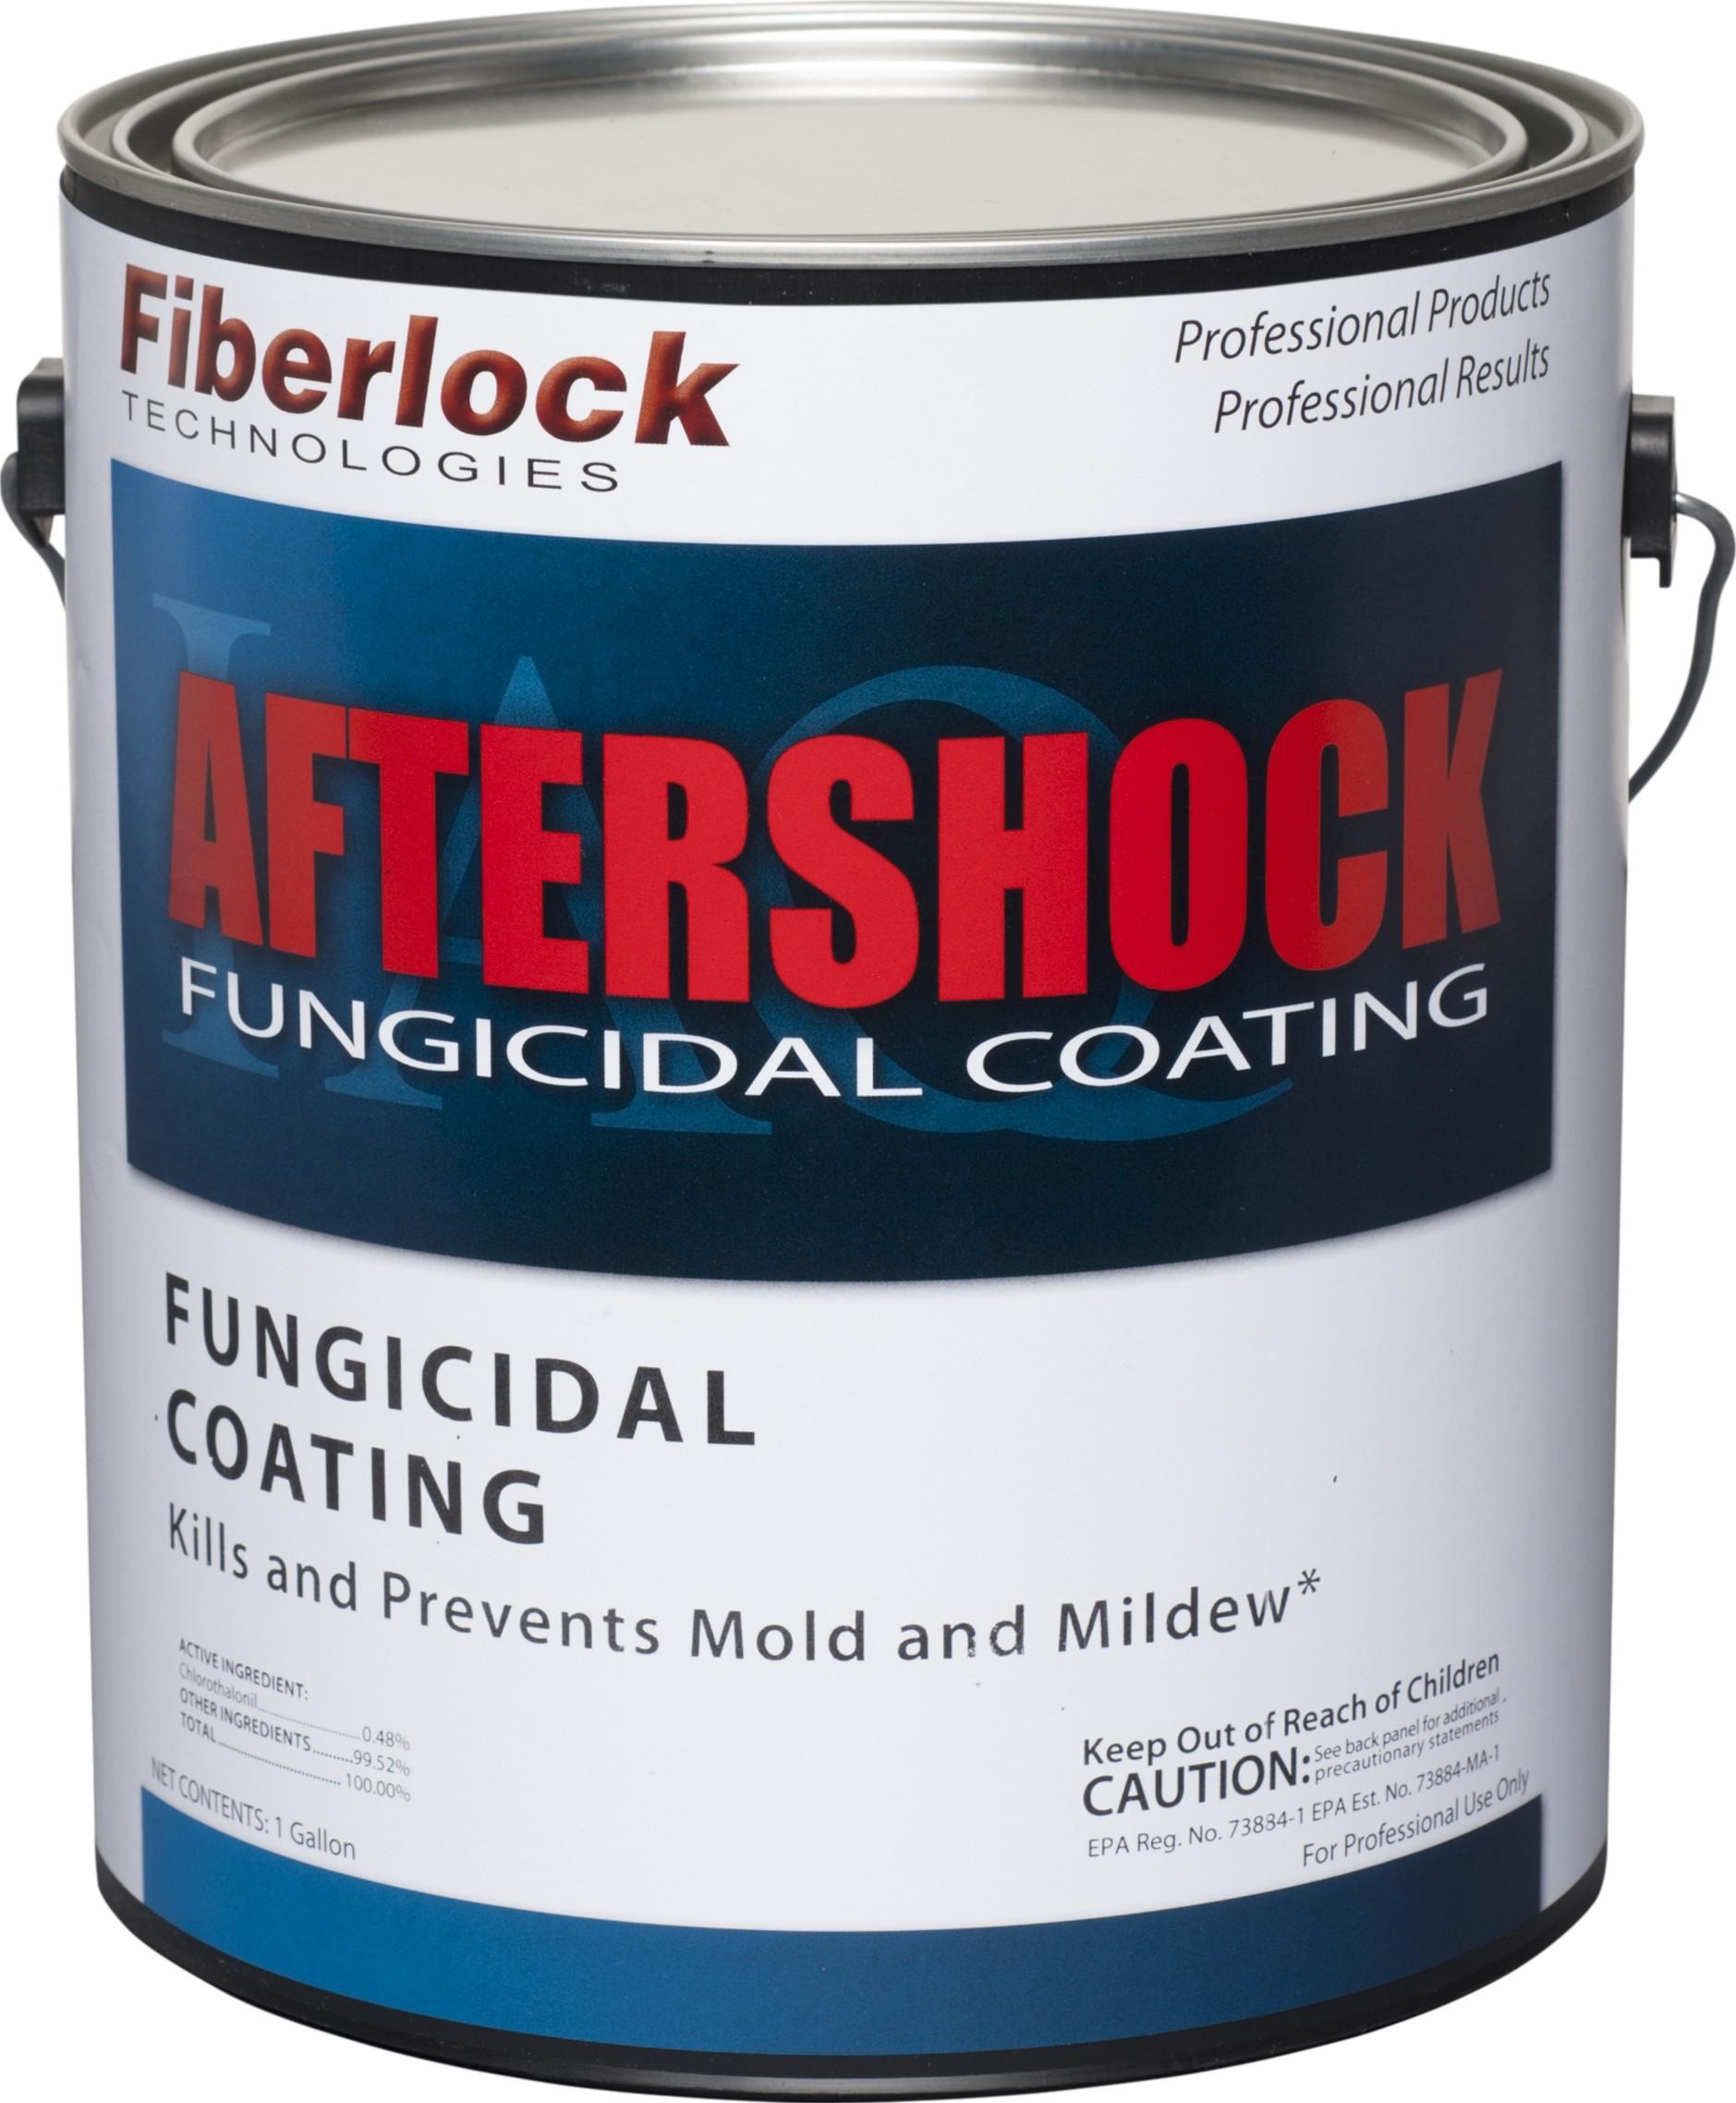 Fiberlock AfterShock Fungicidal Coating - WHITE (1 Gallon)